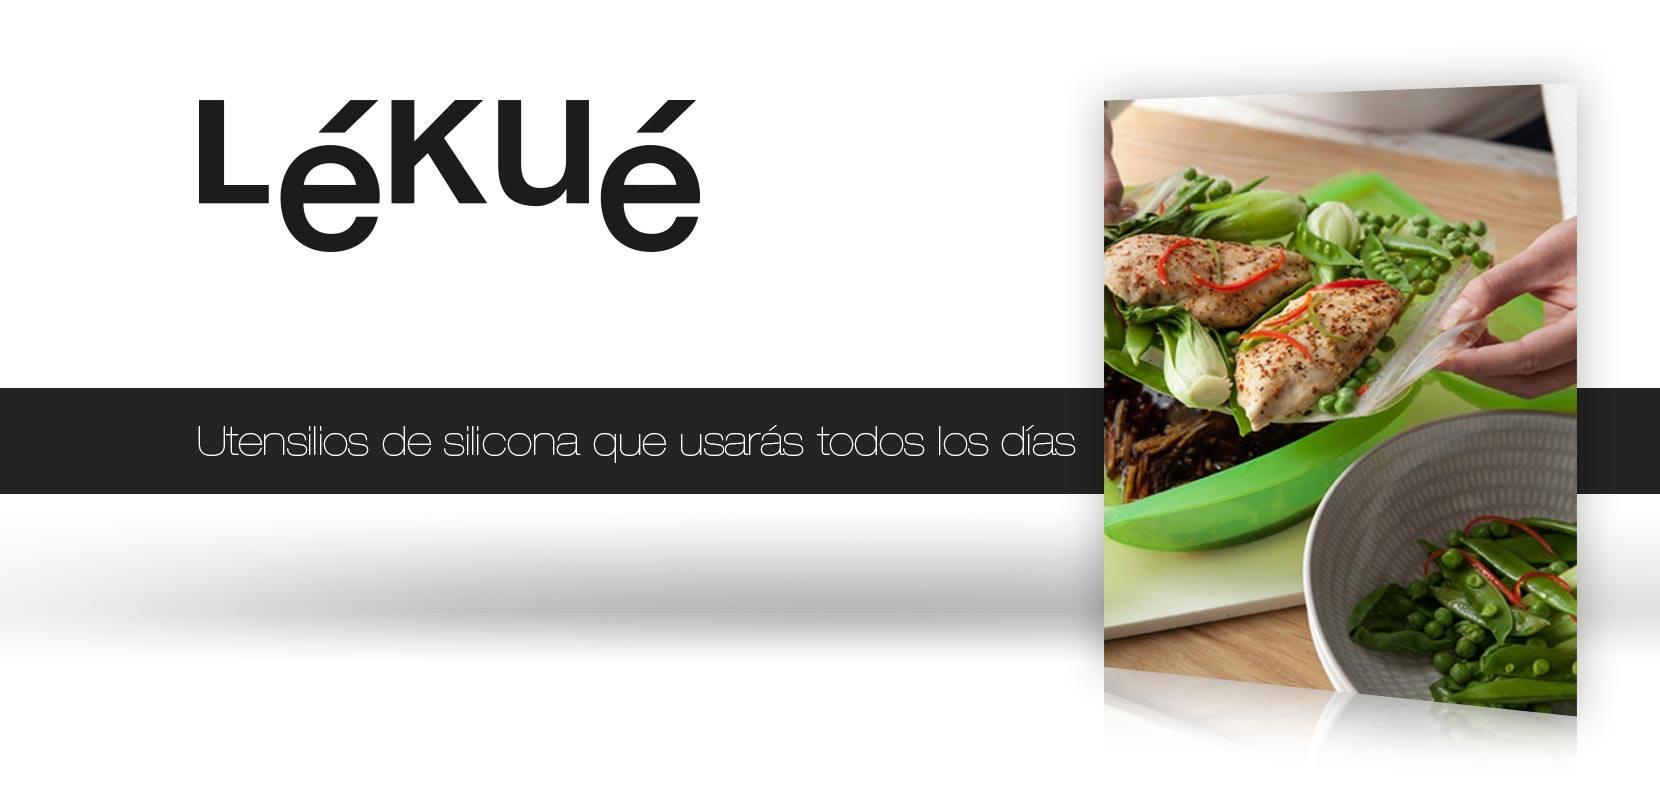 L ku menaje de cocina de silicona marbella m laga for Fabrica de utensilios de cocina